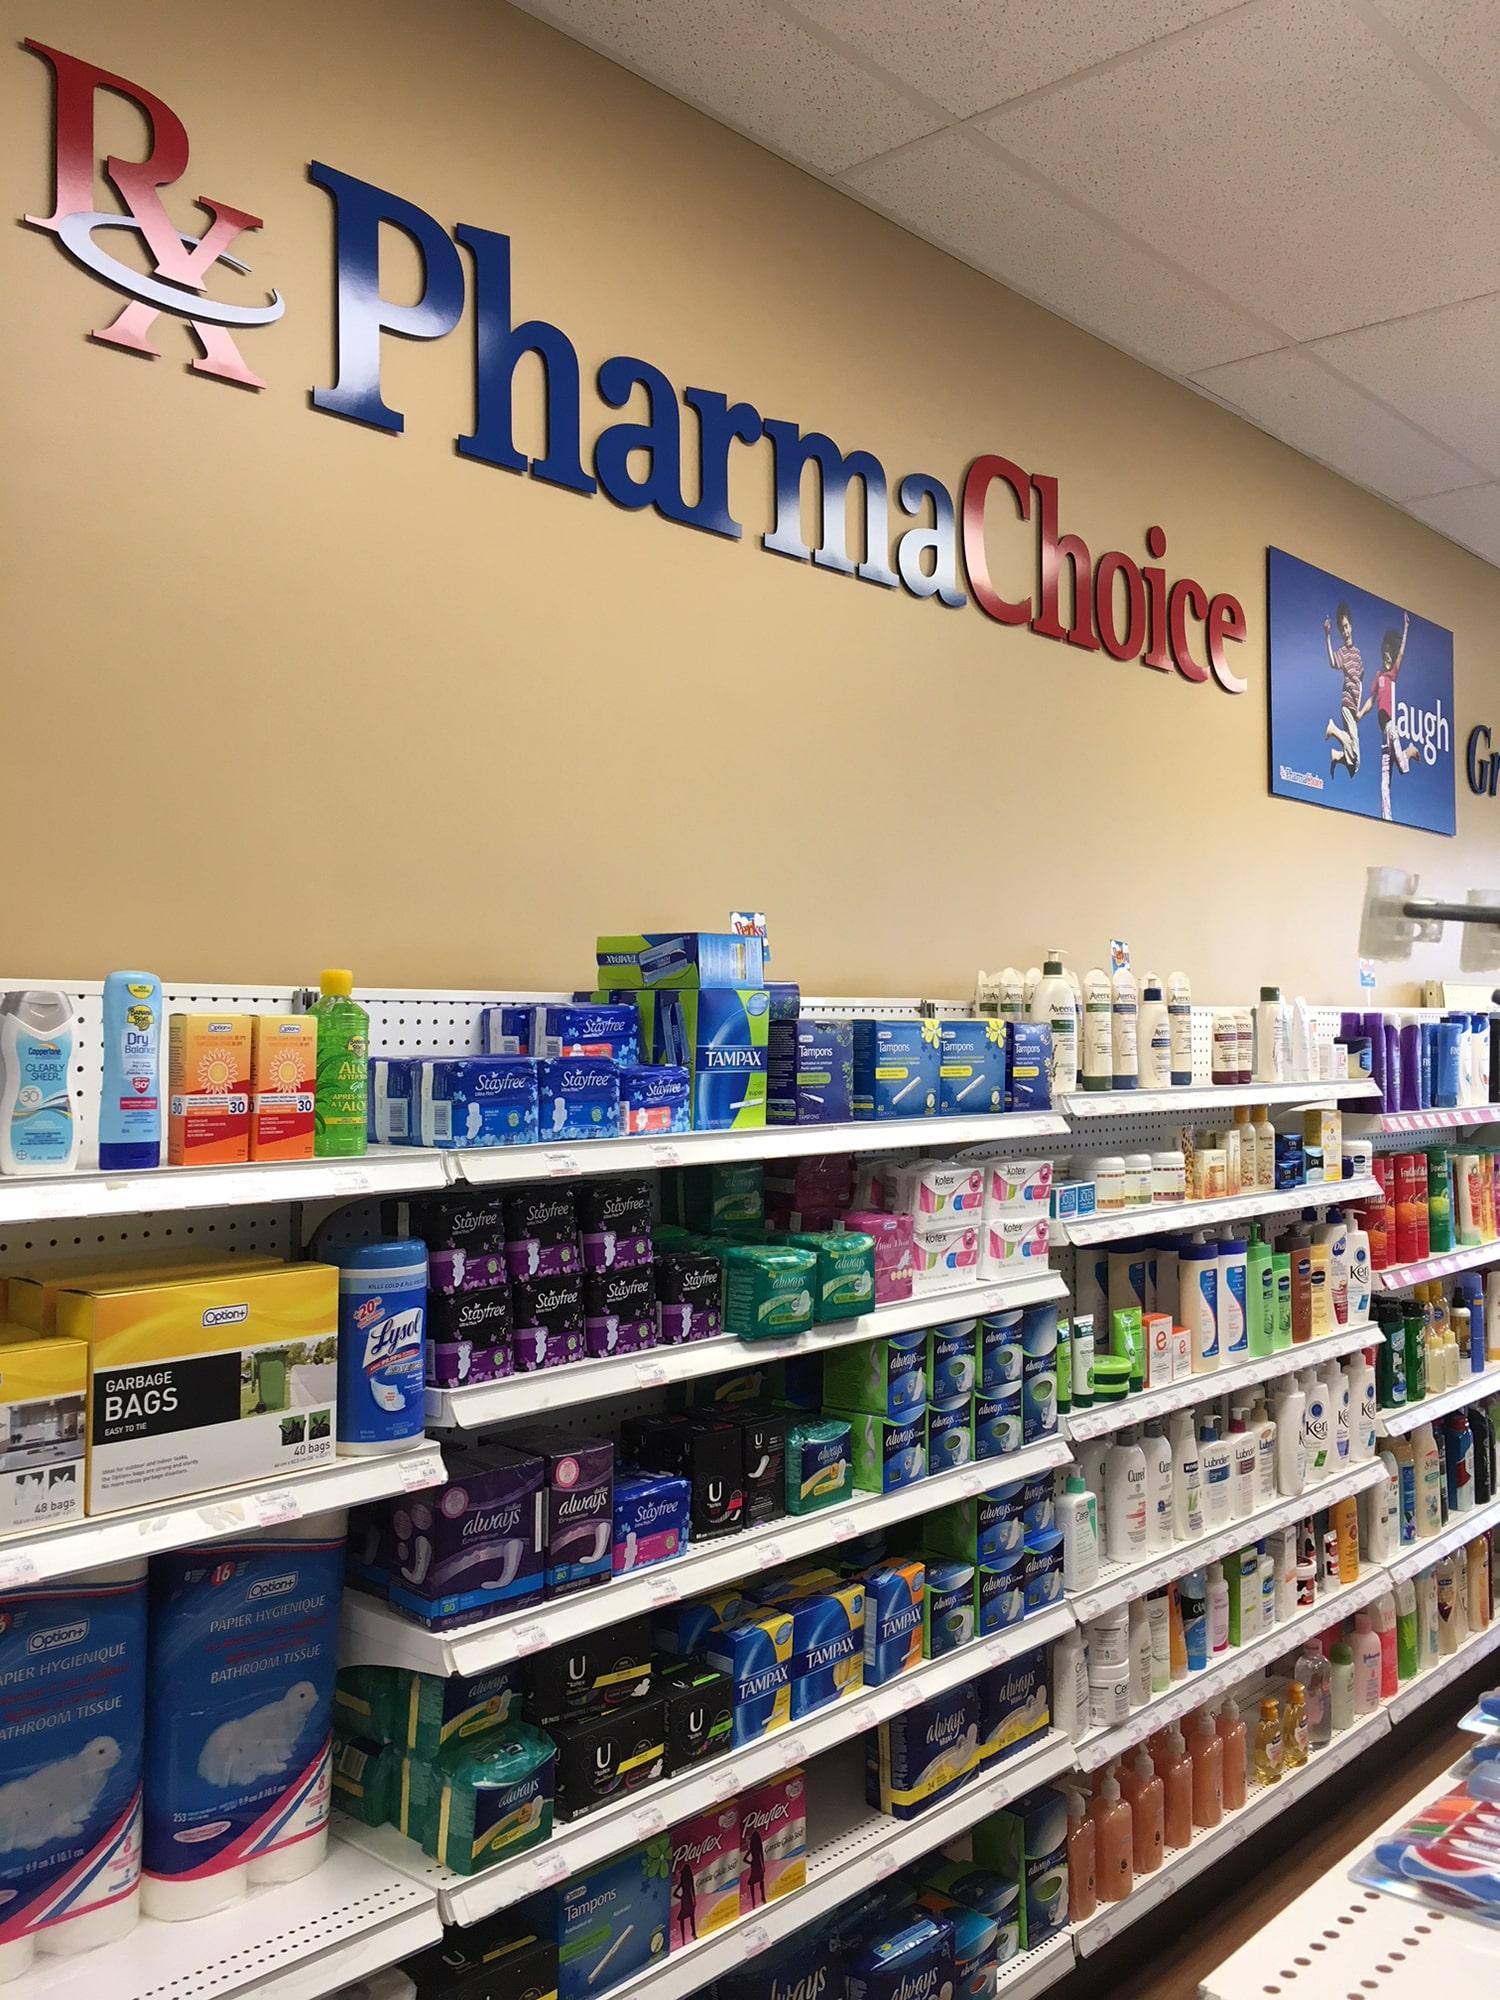 People's Hamilton pharmacy